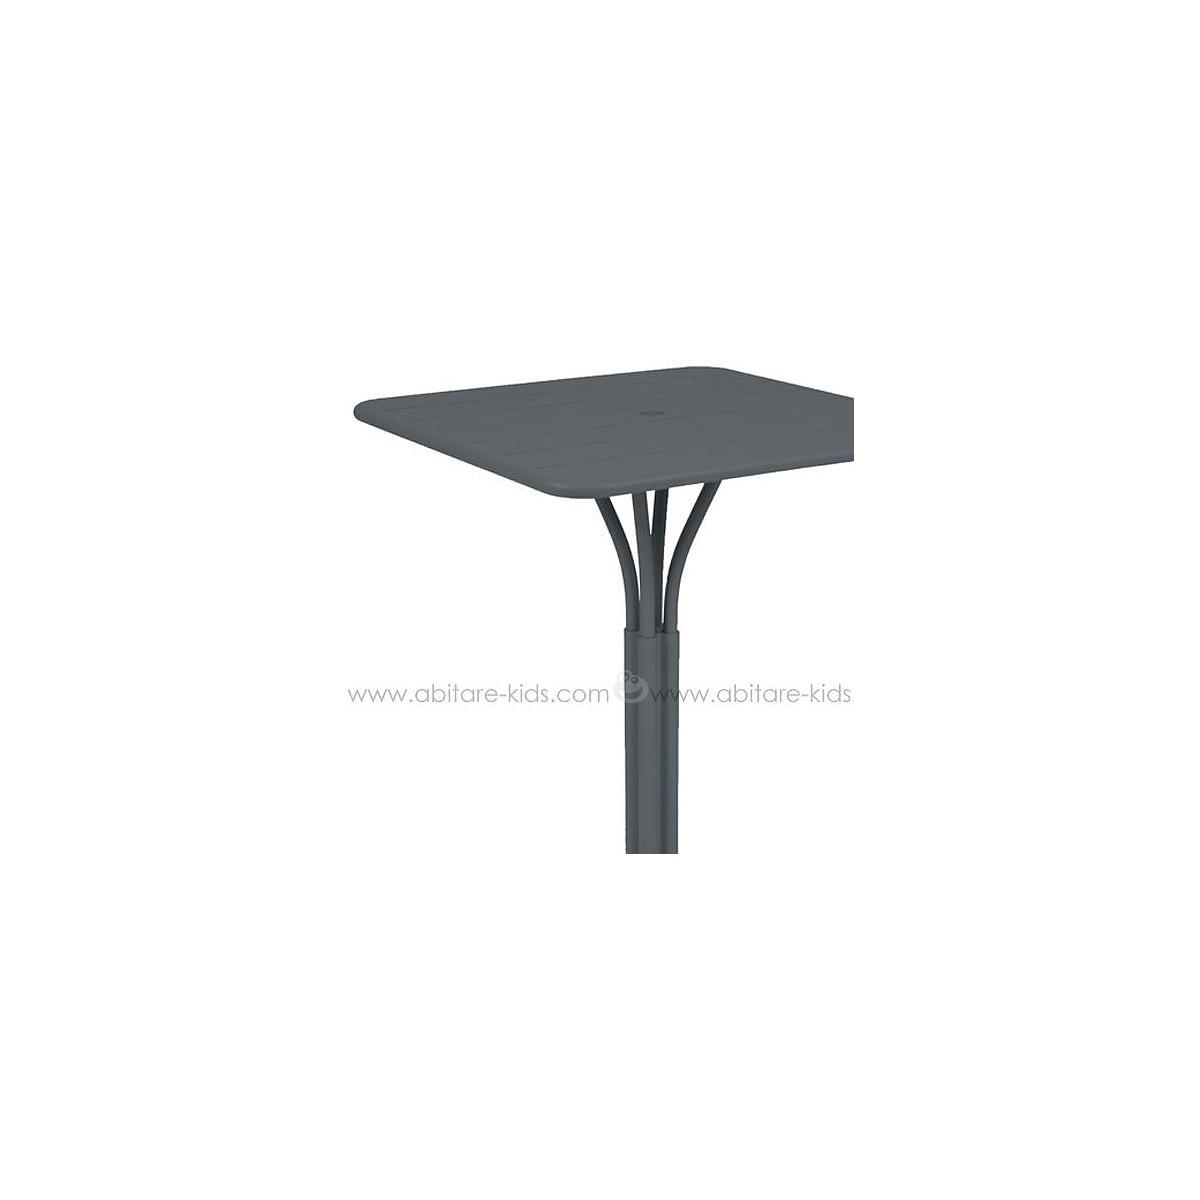 LUXEMBOURG by Fermob guéridon haut 80x80 cm gris orage